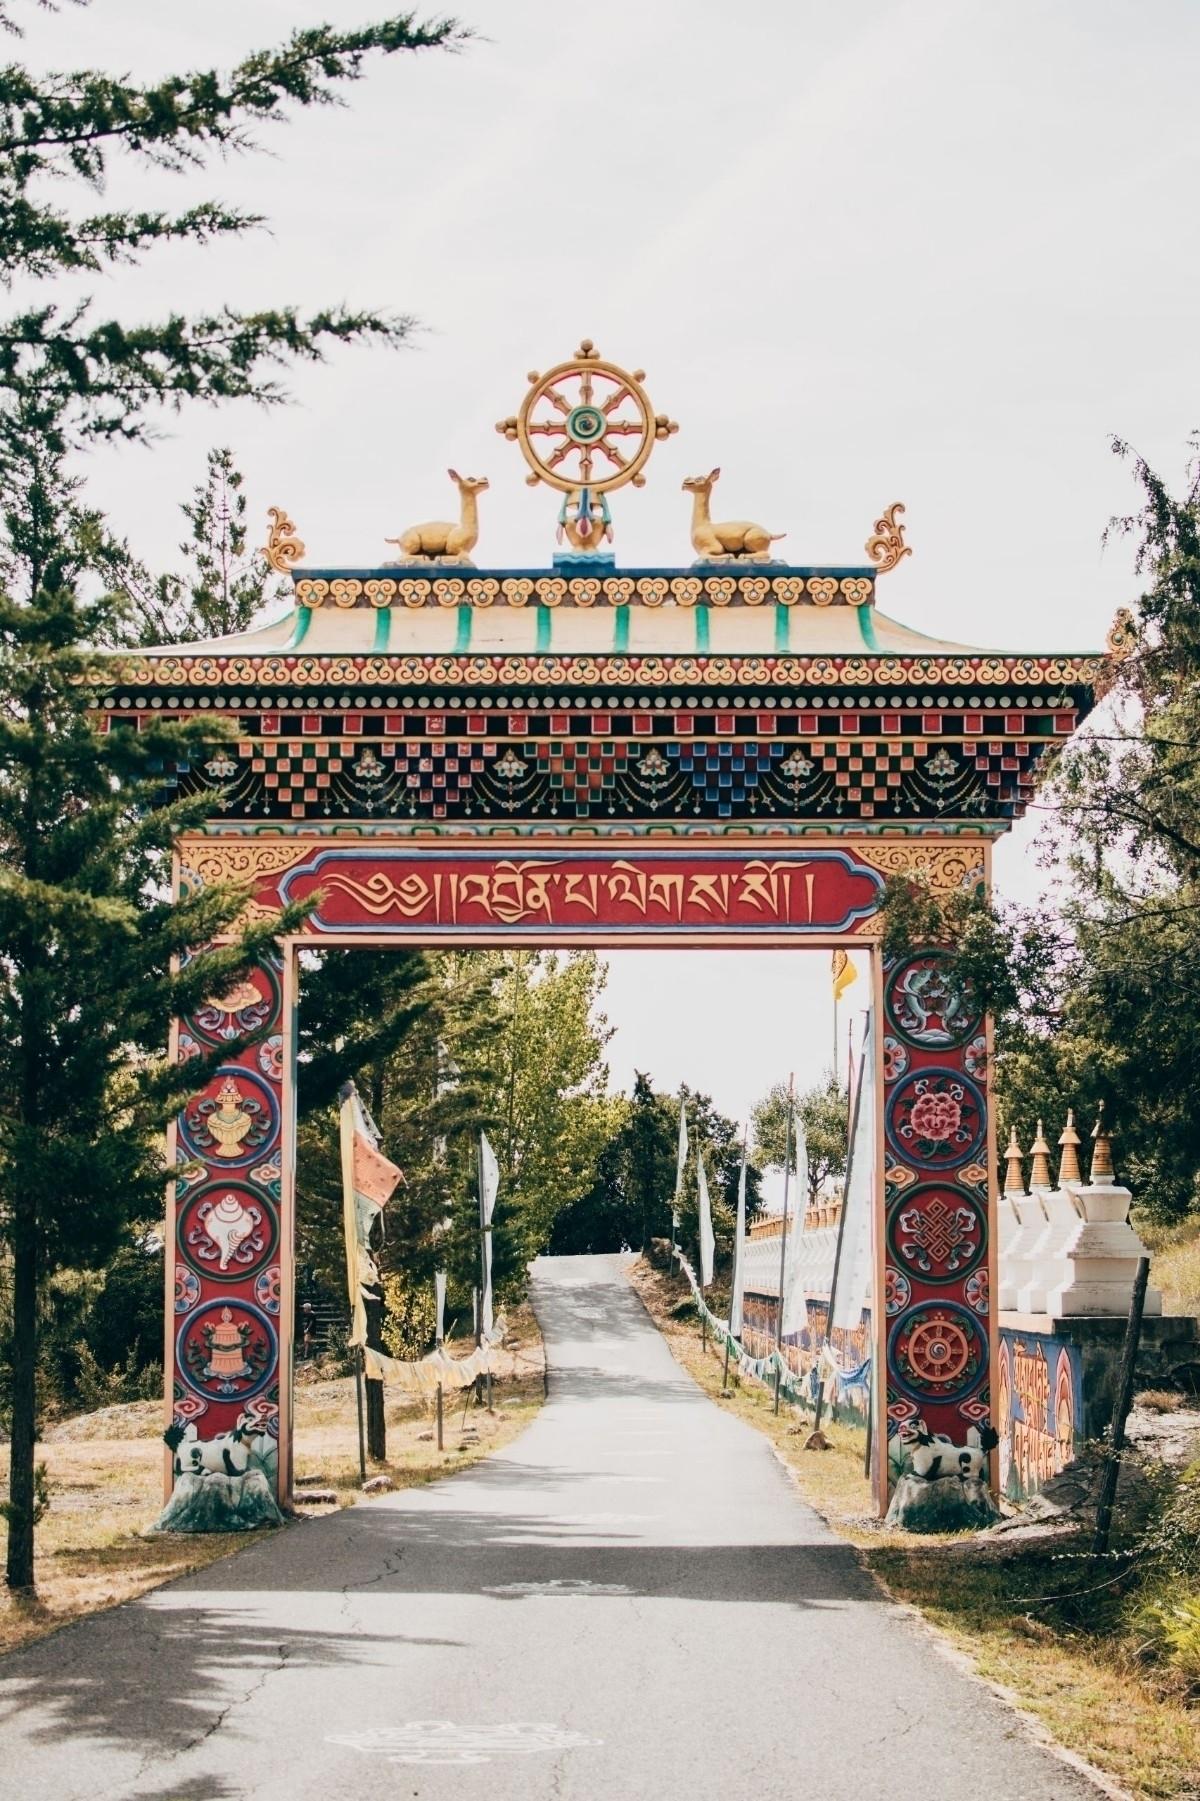 Panillo - Budism, Architecture, Building - caeshoot | ello